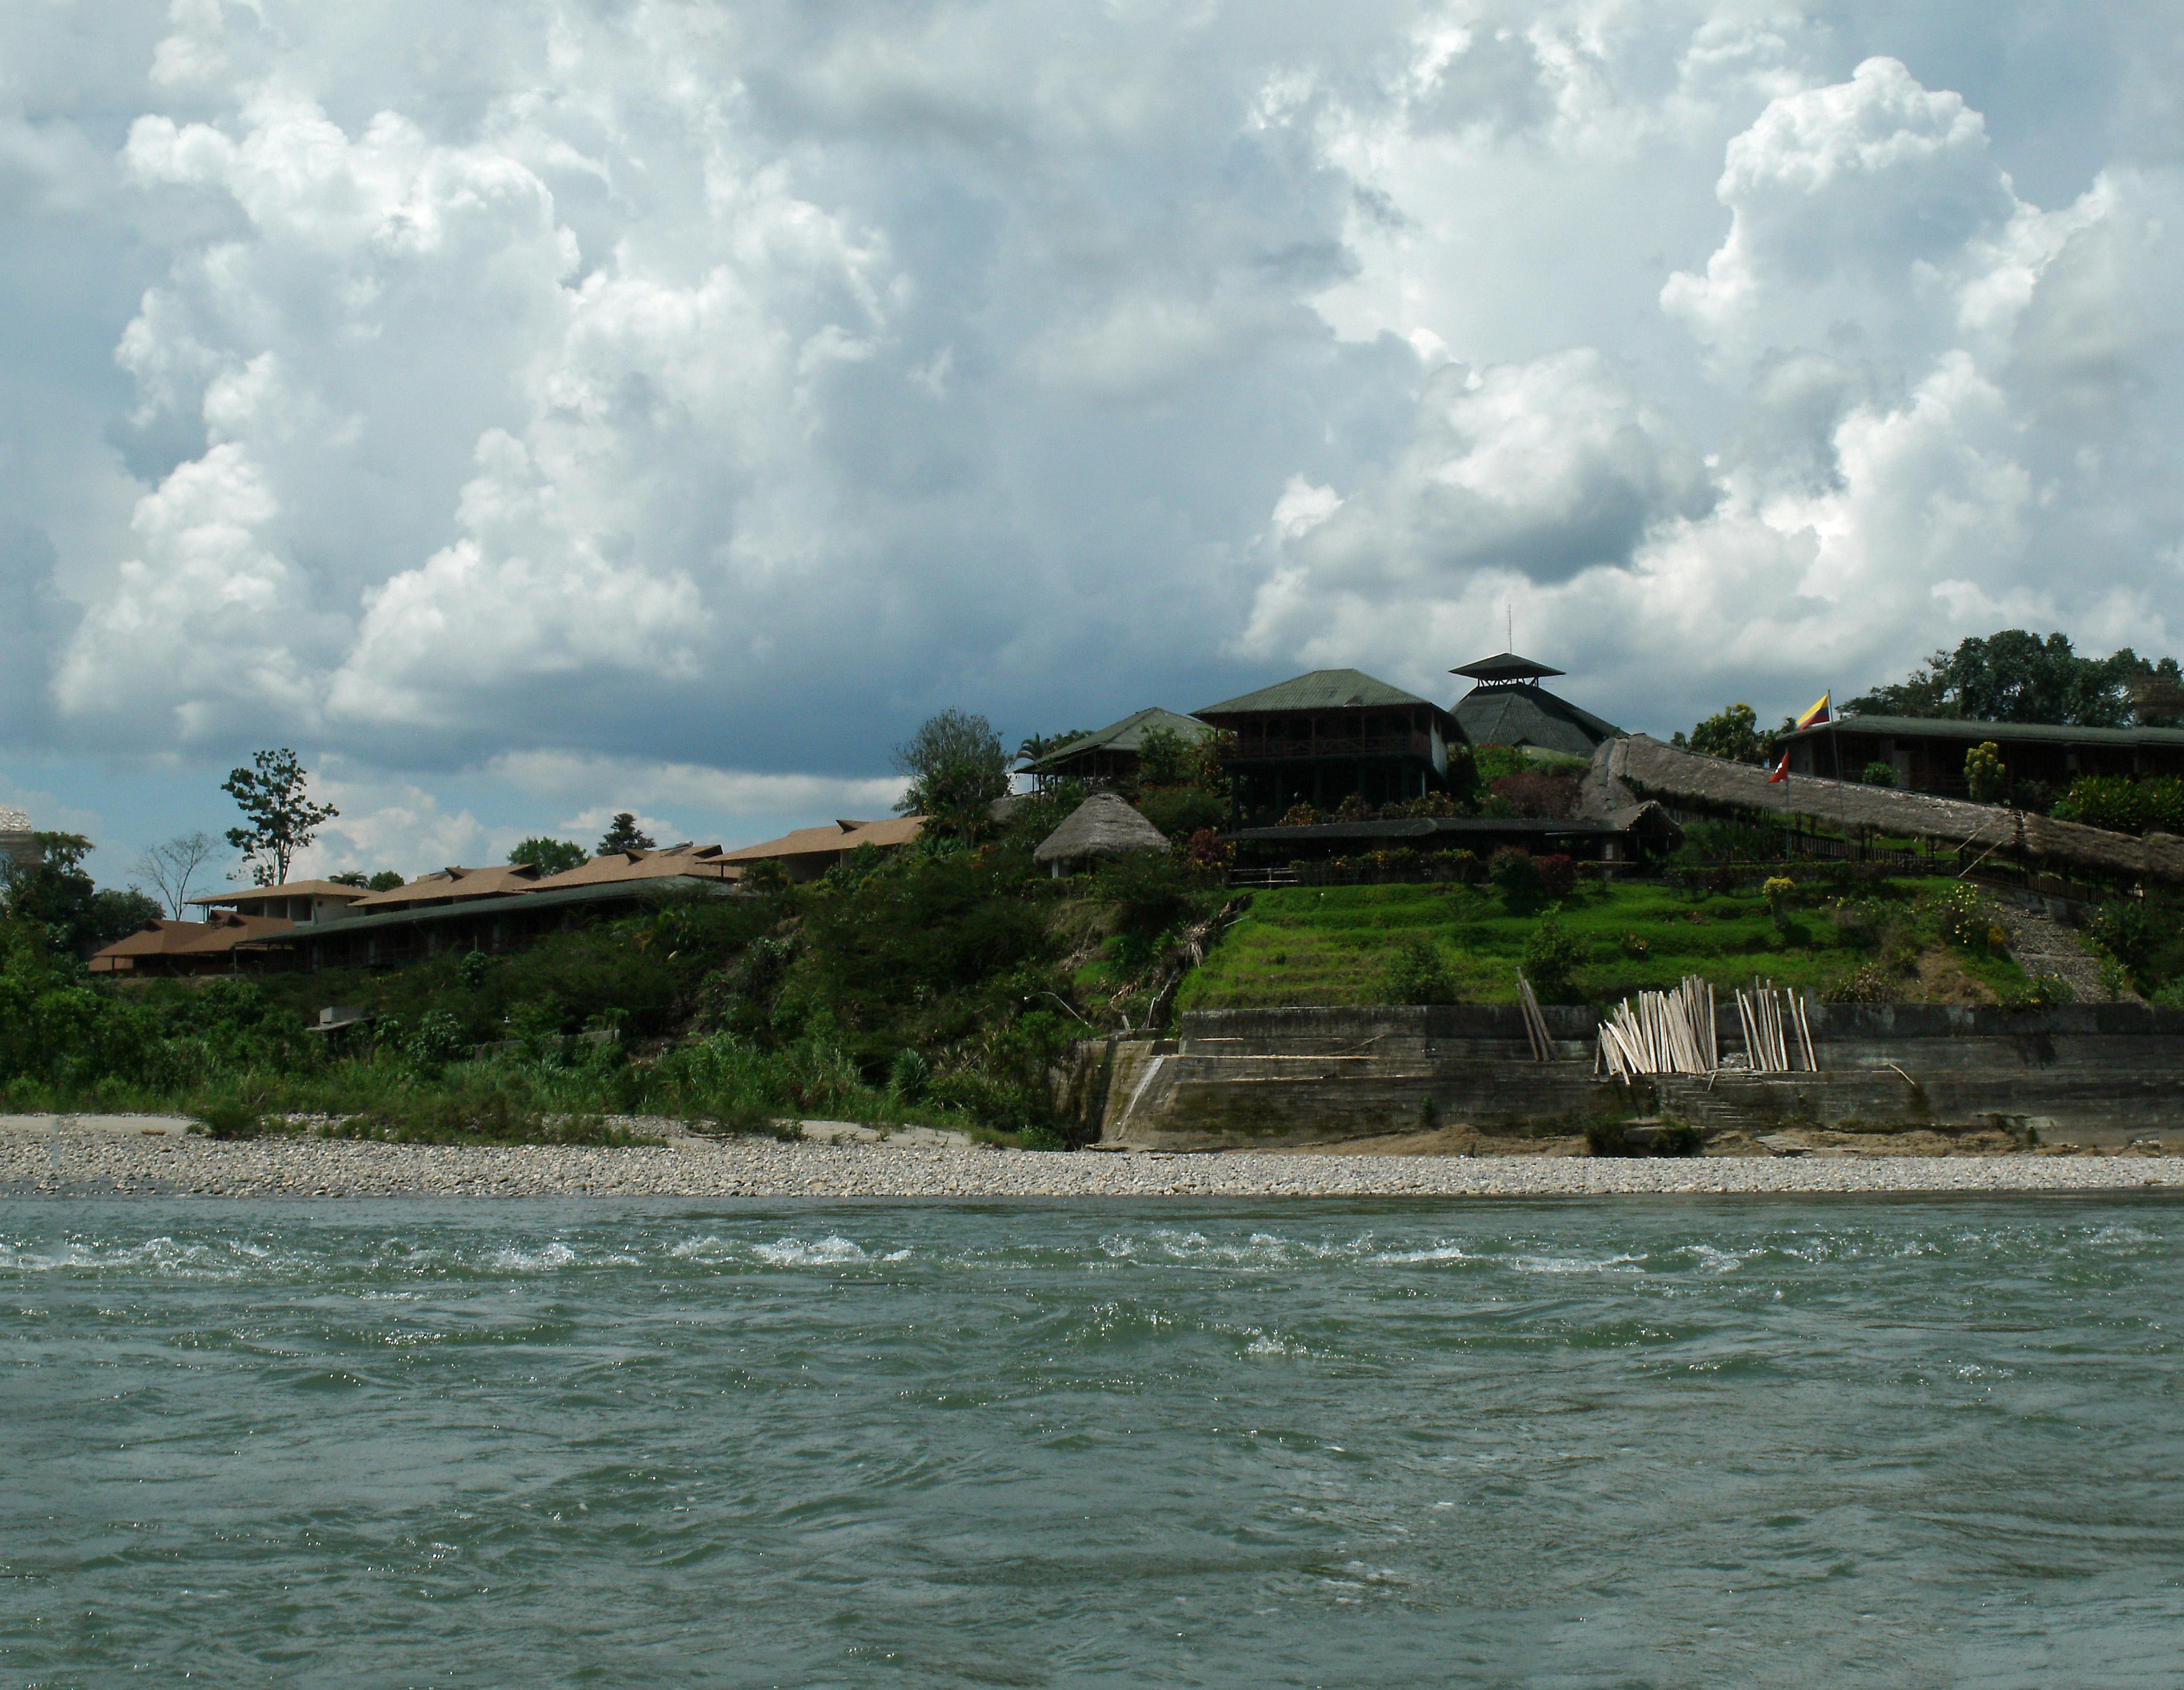 Casa del Suizo Lodge on Napo River in Ecuador Amazon